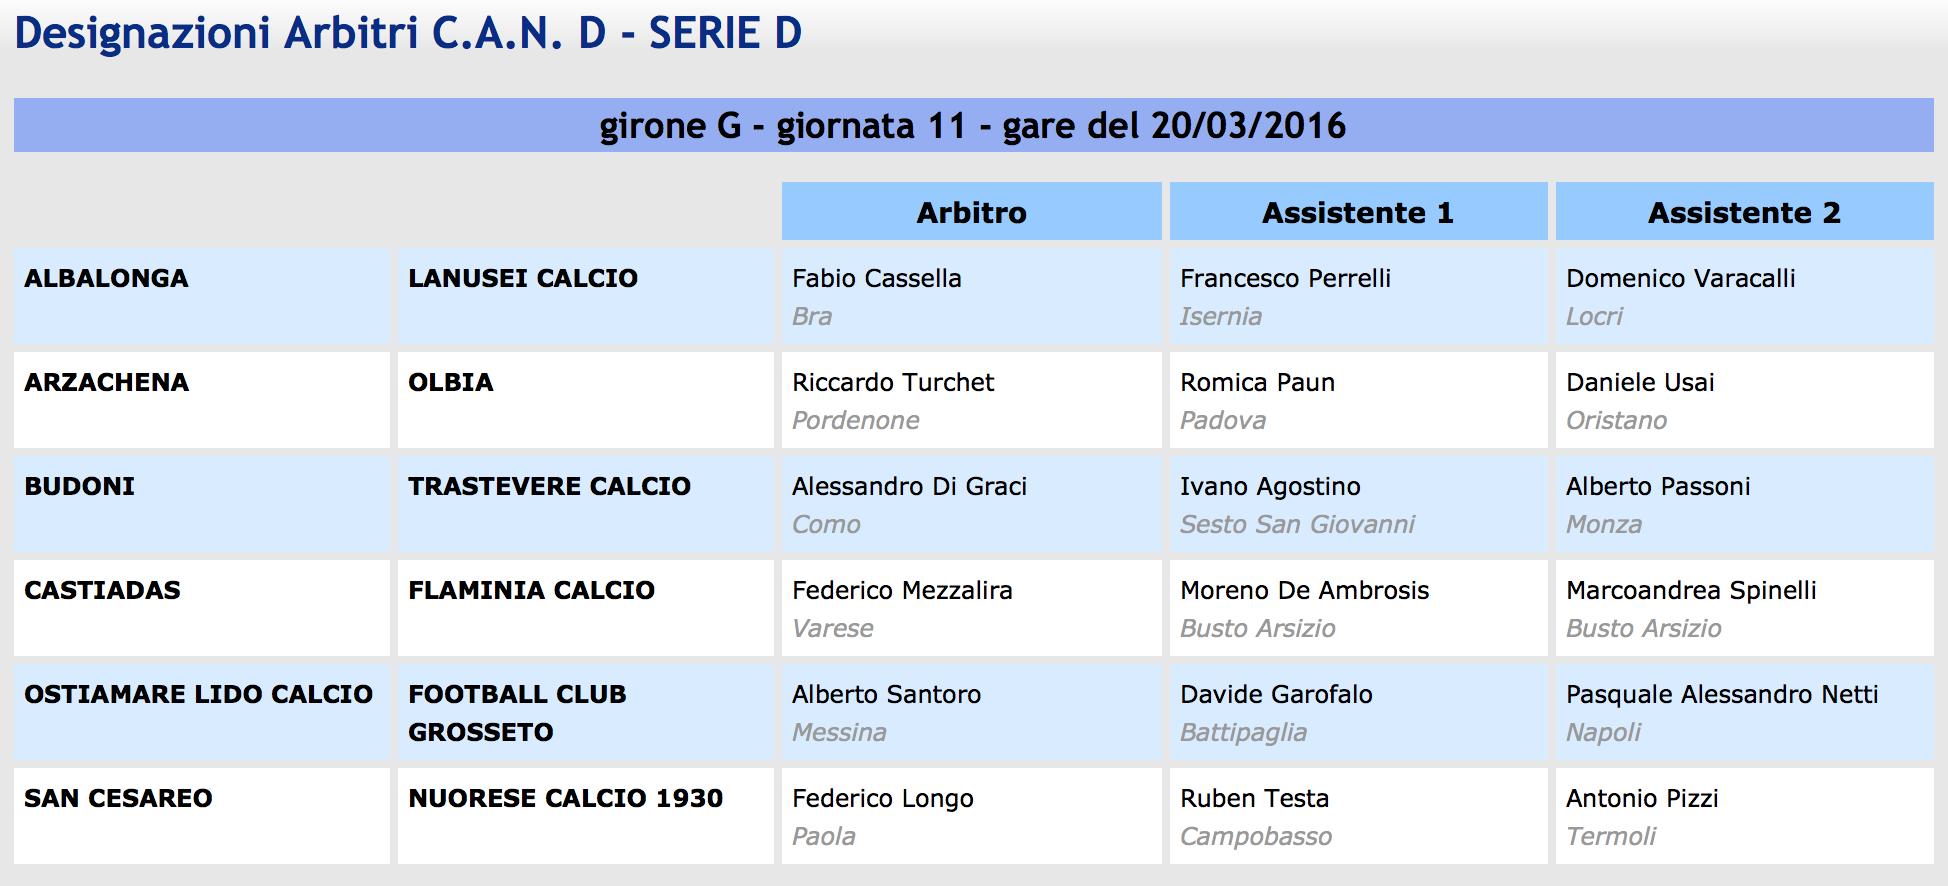 designazioni arbitrali Serie D girone G 28^ giornata 2015-16